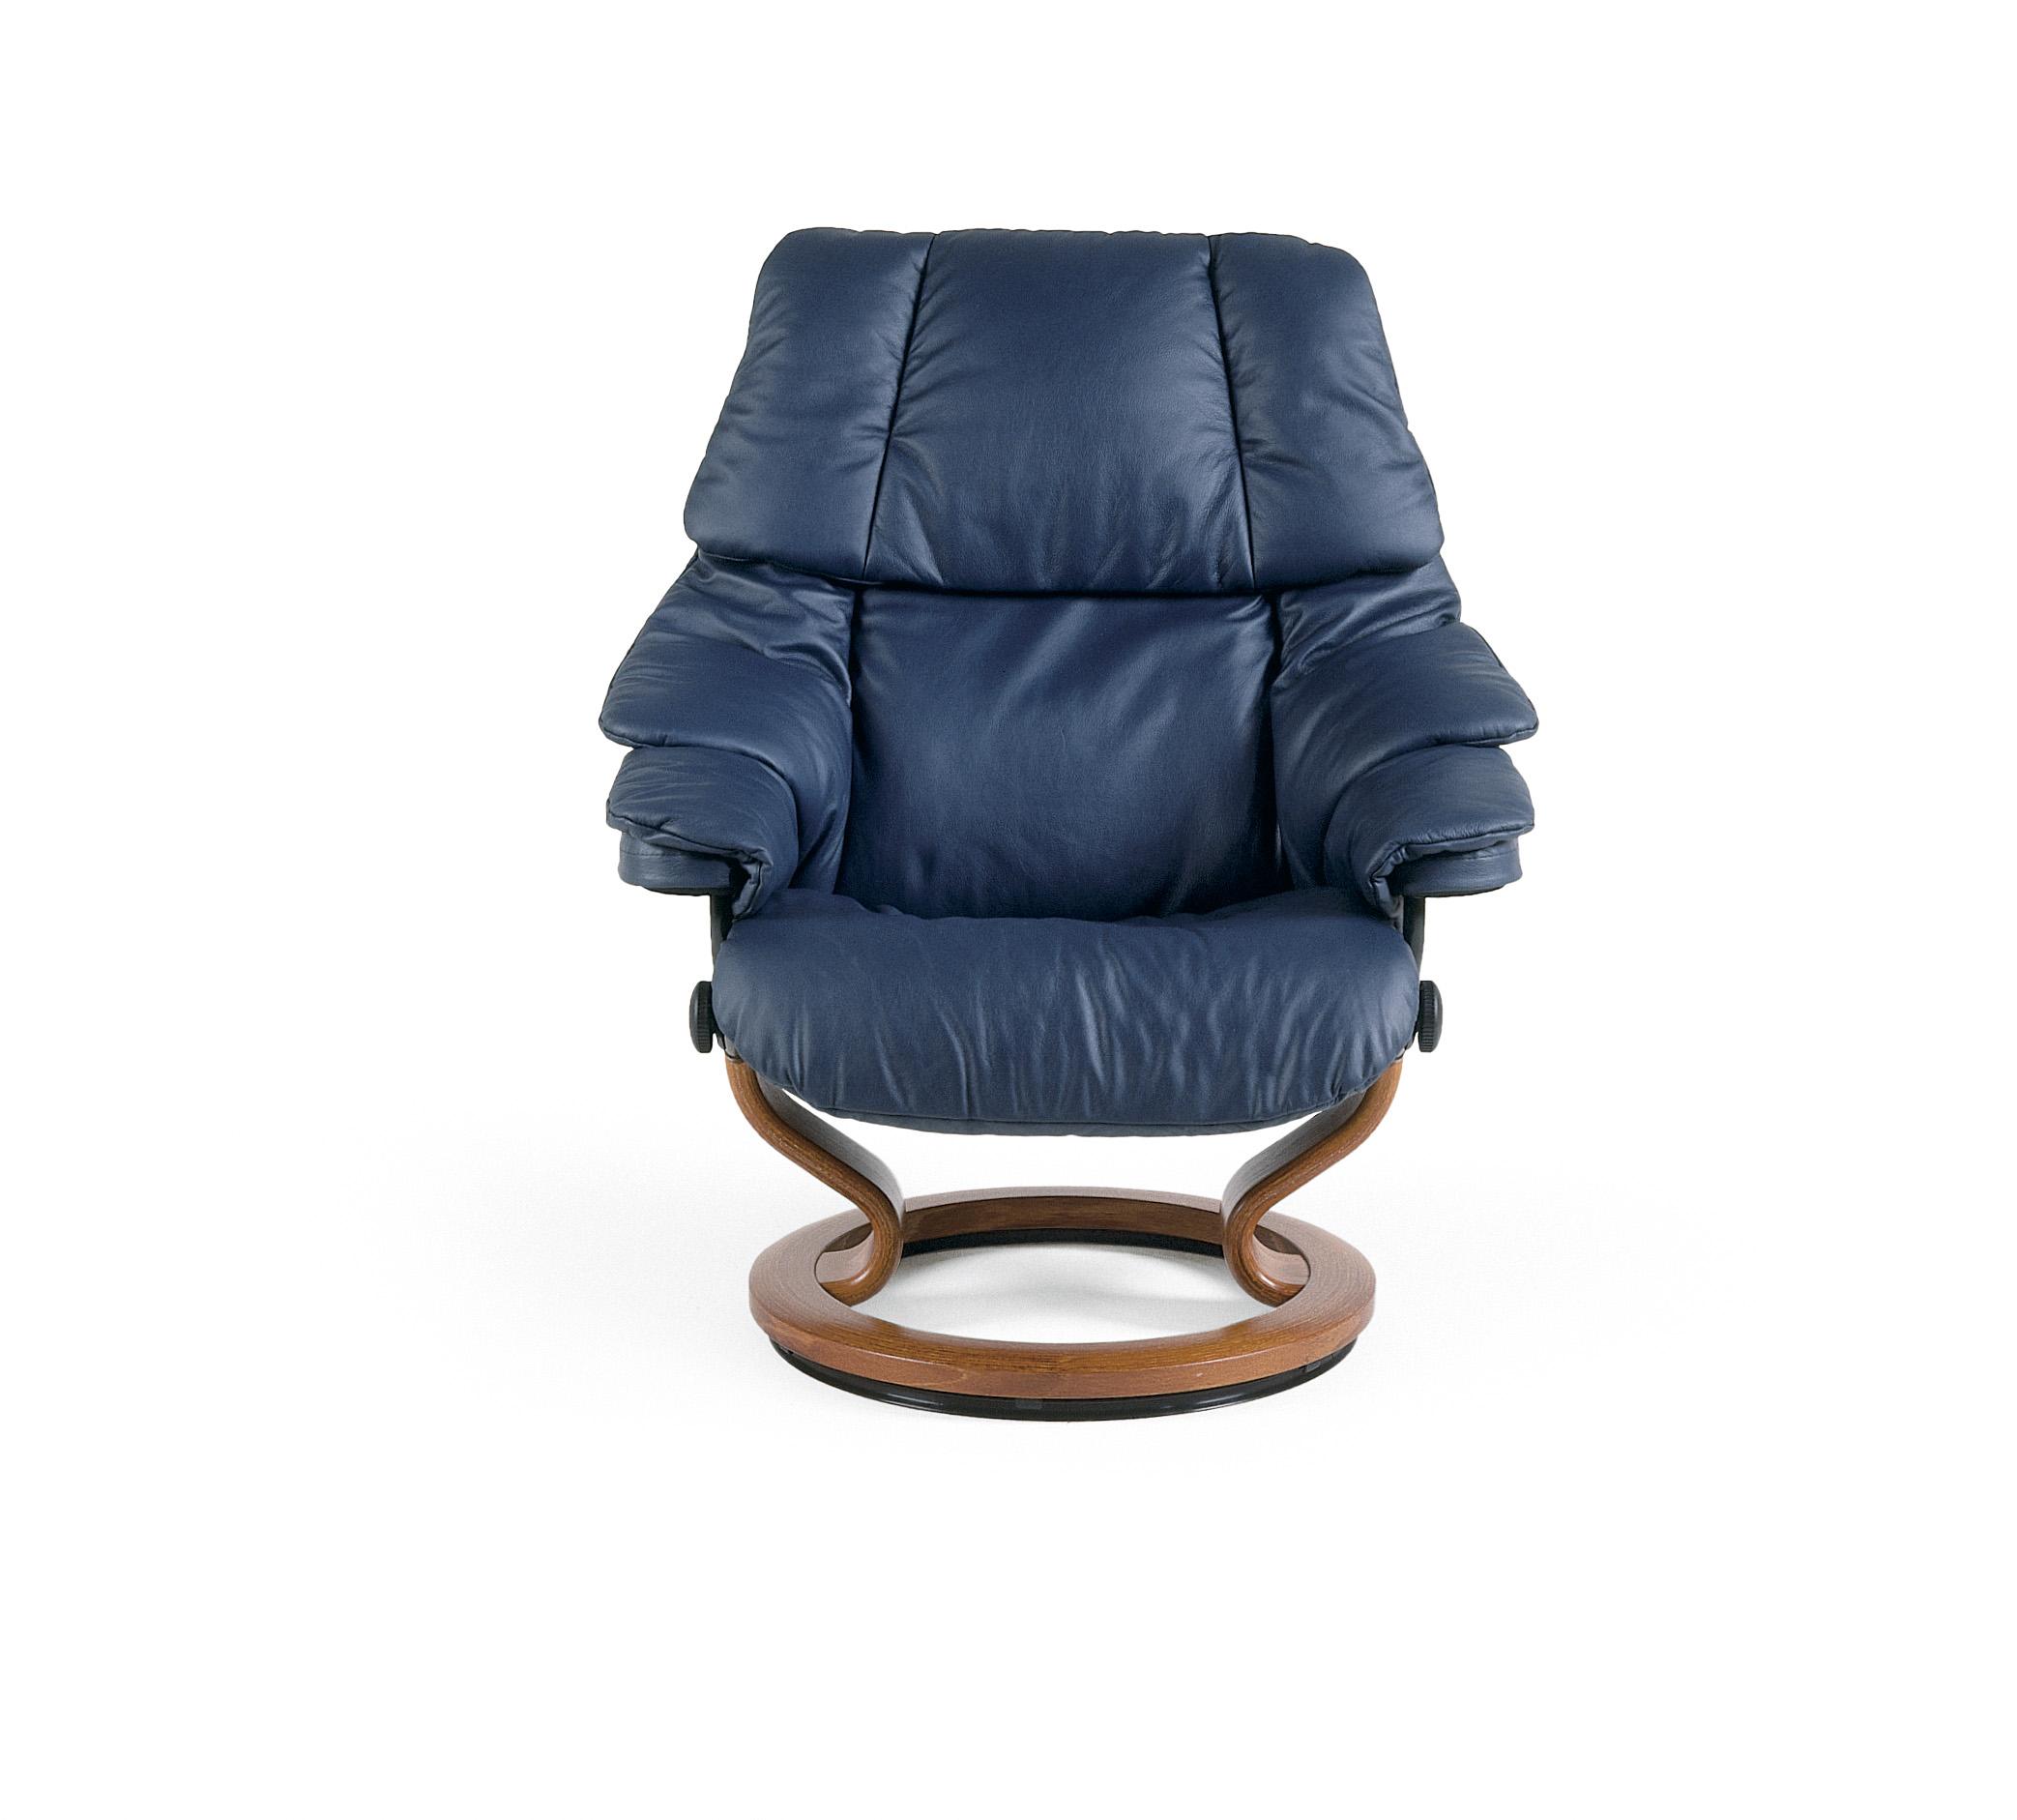 Stressless Set Reno Classic Sessel Mit Hocker Größe L Leder Paloma